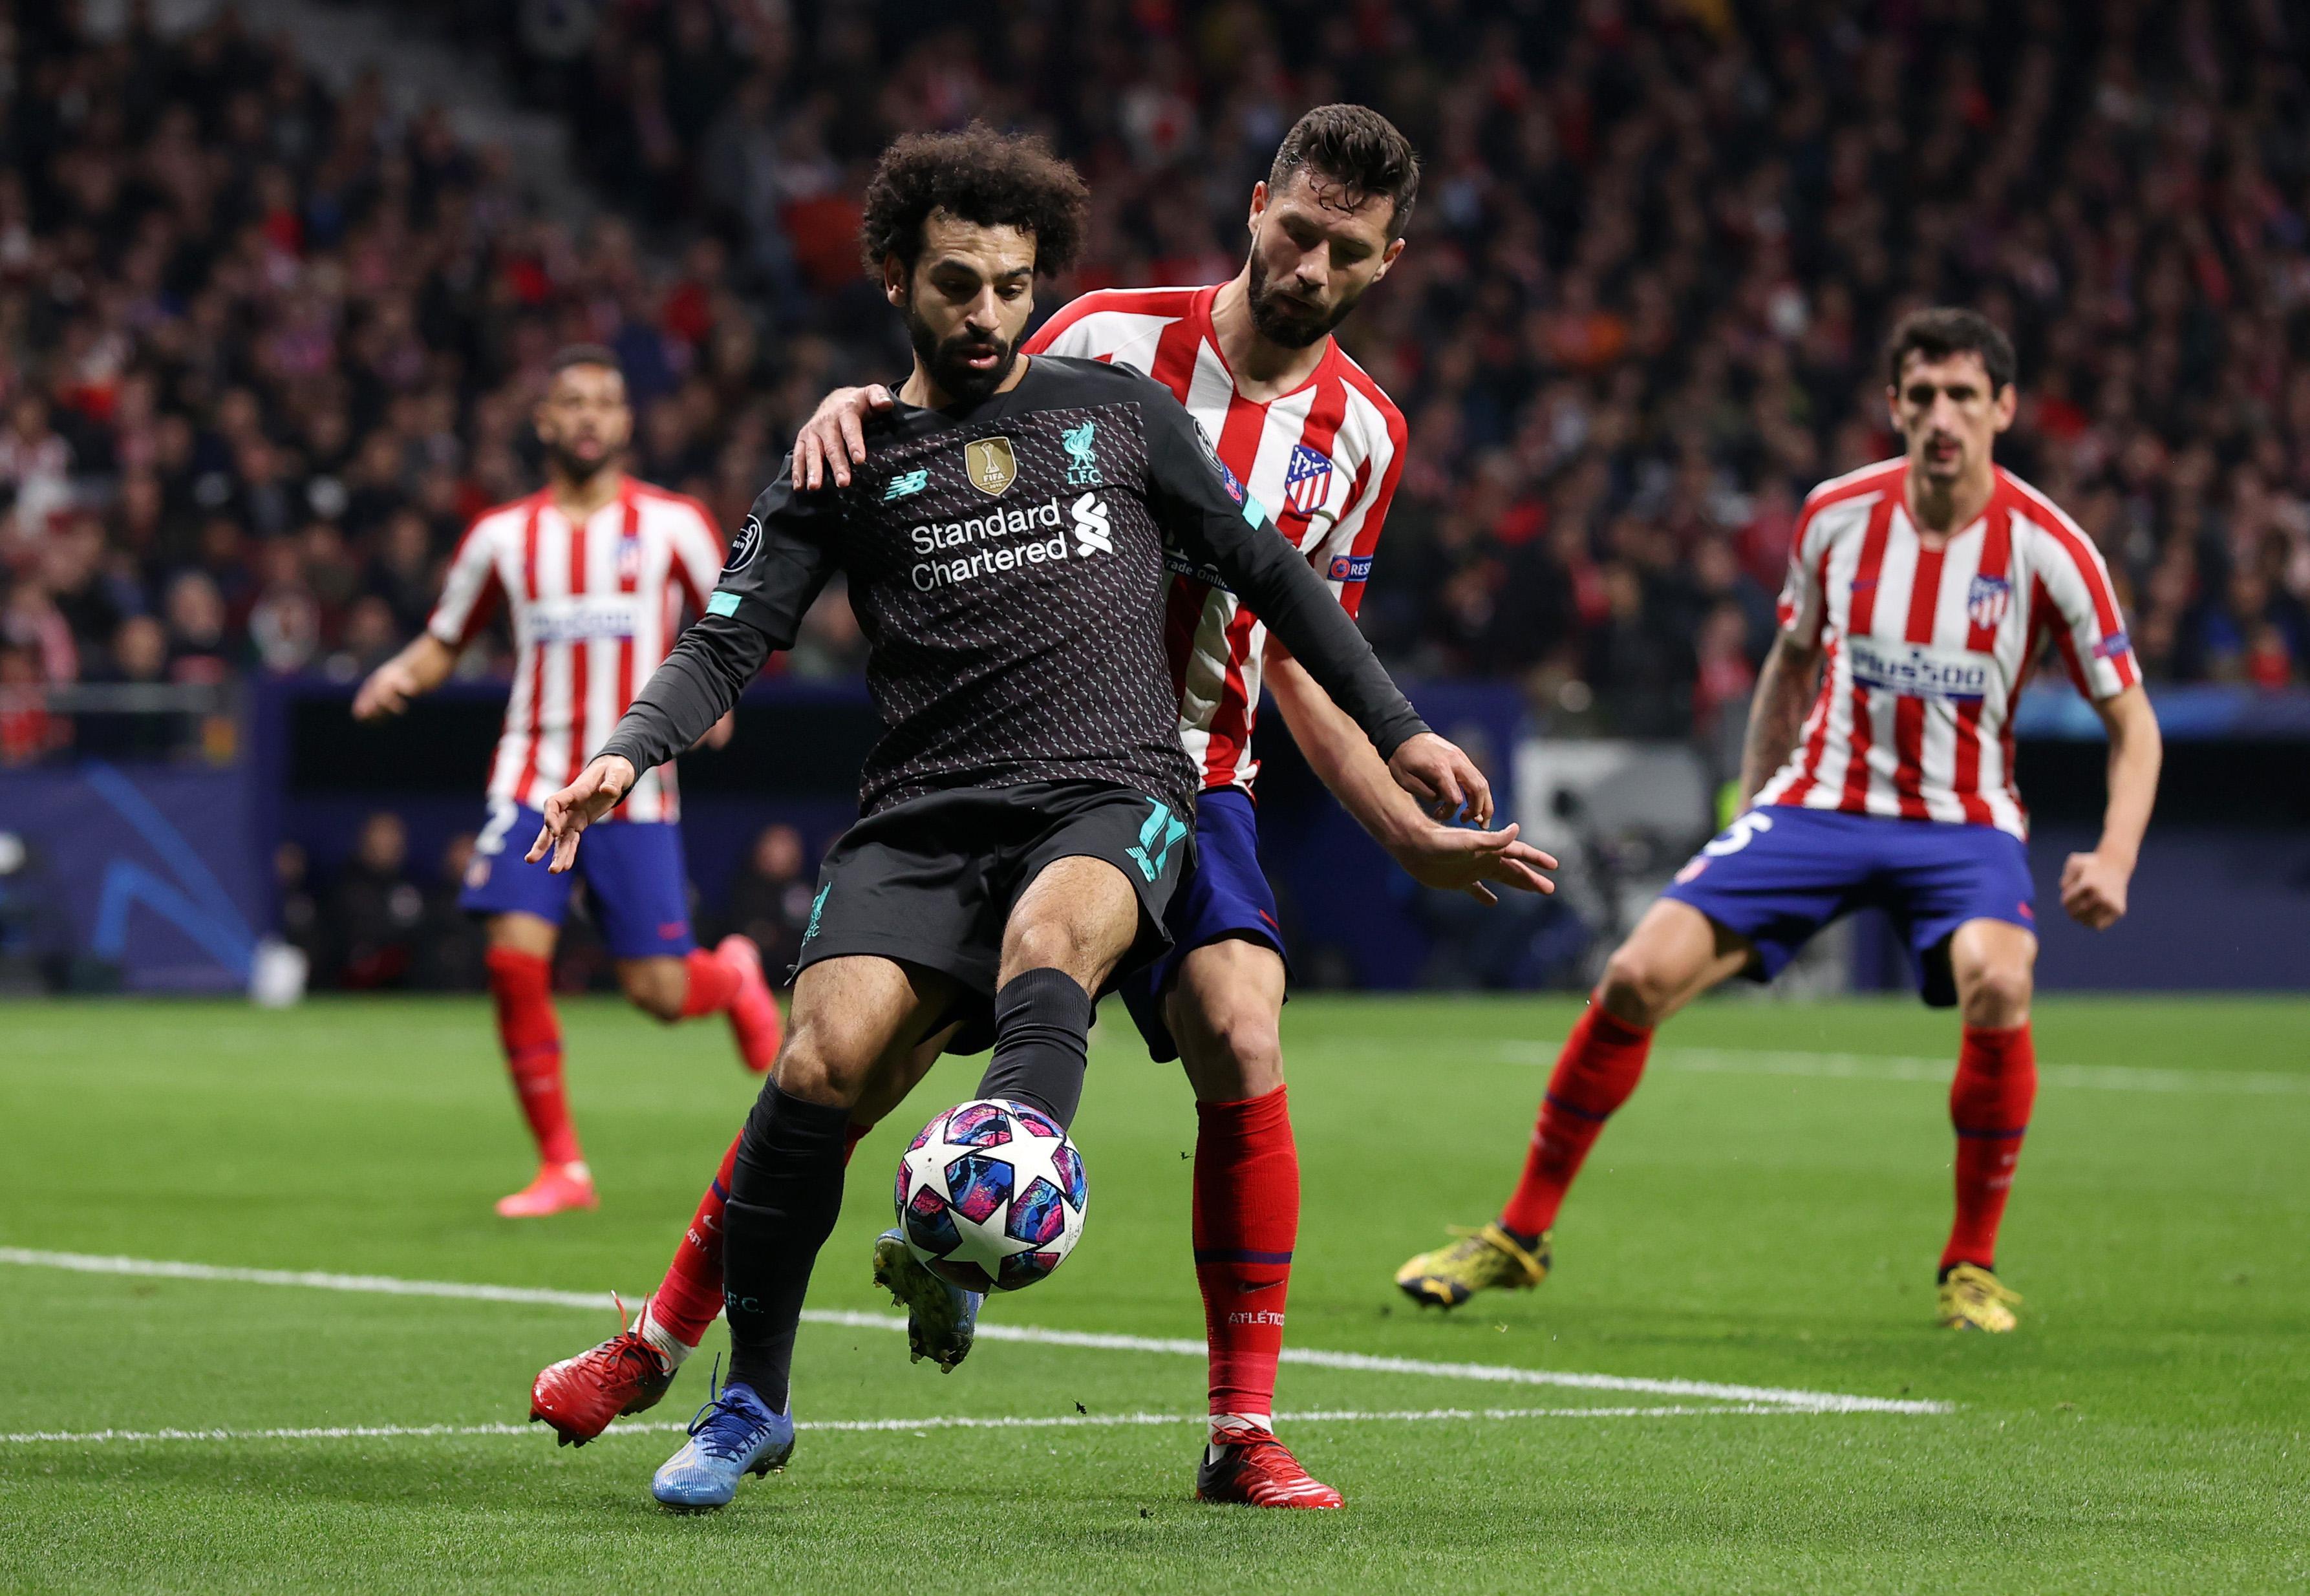 Melawan Liverpool, Atletico Bertahan Sangat Luar Biasa